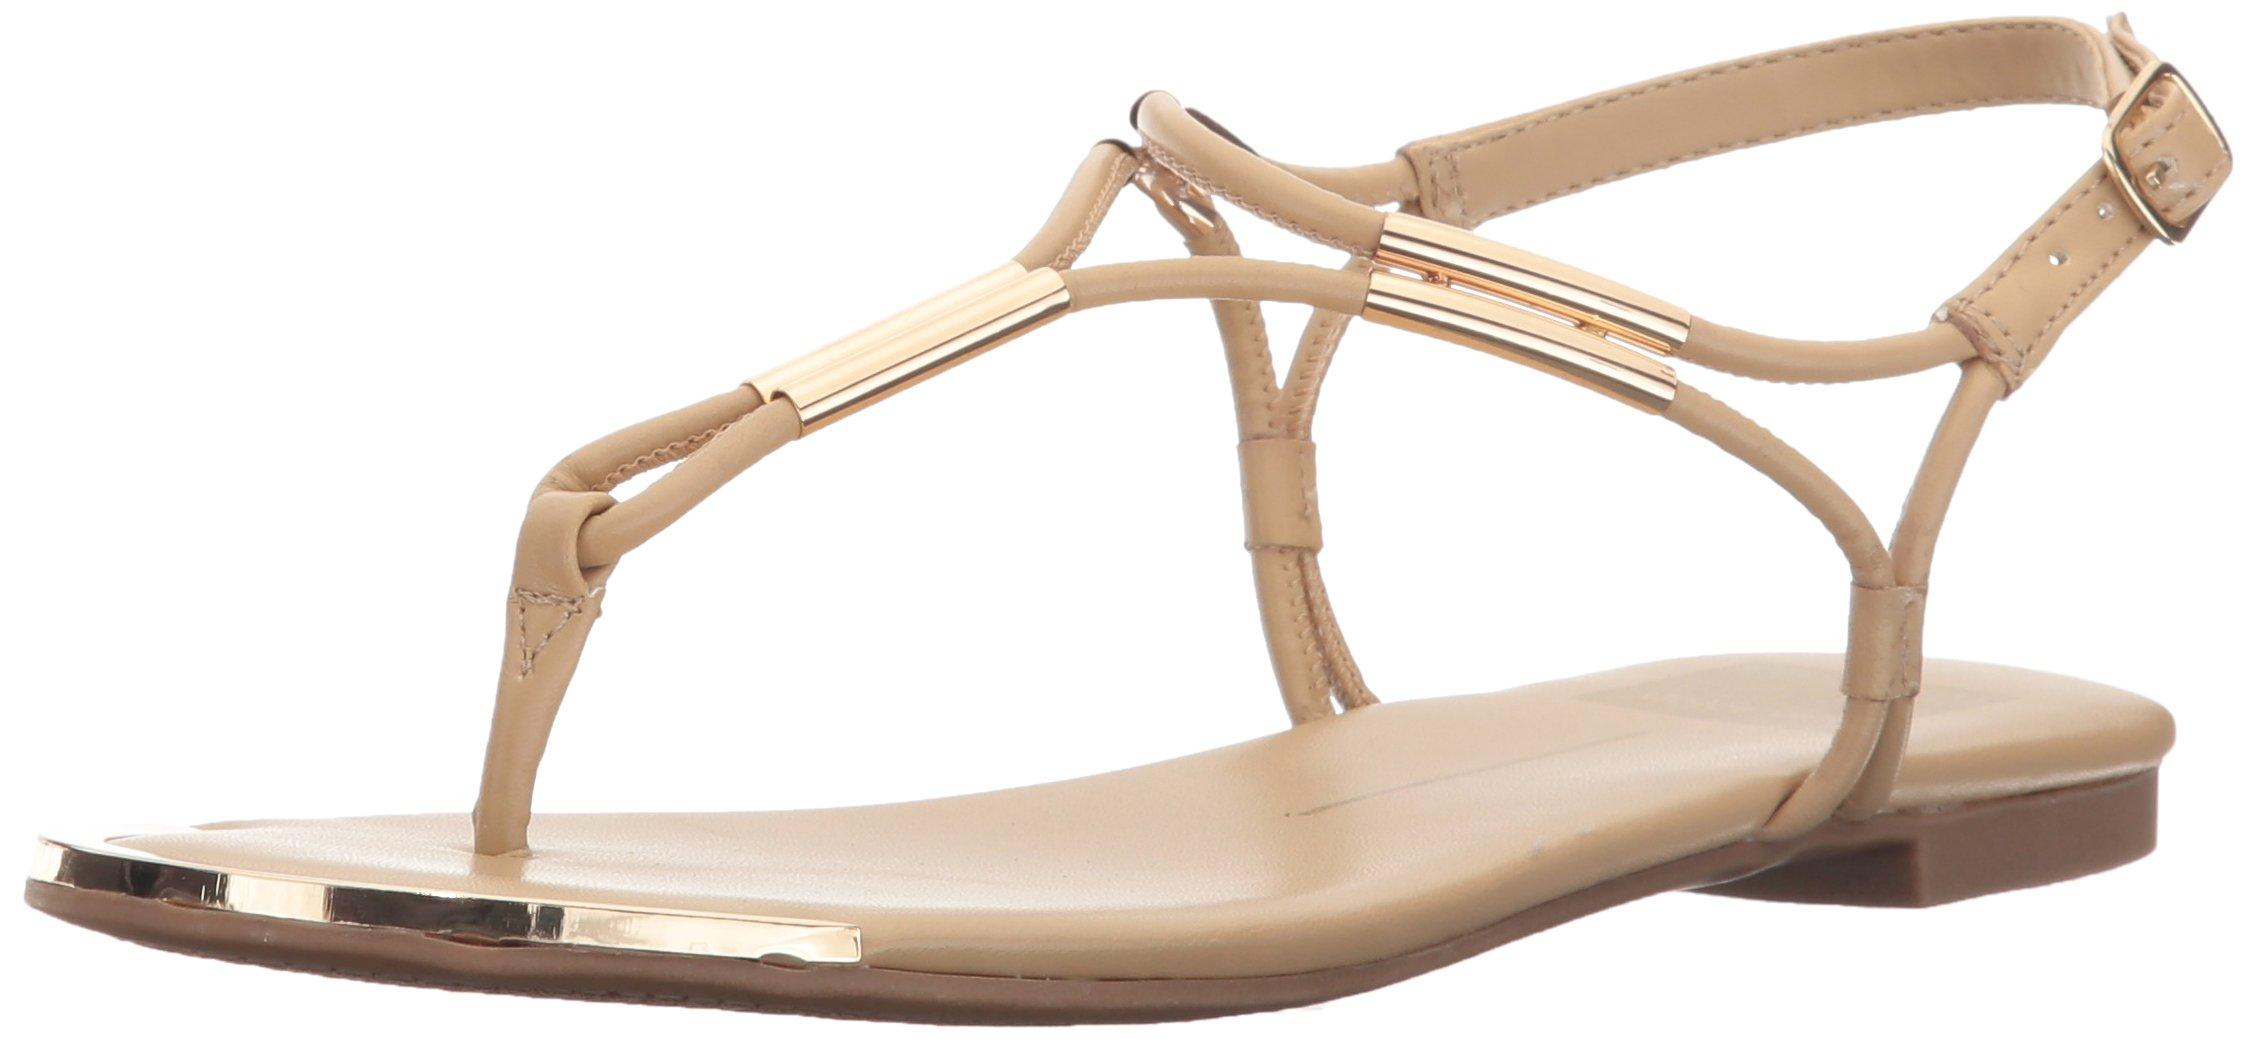 Dolce Vita Women's Marly Flat Sandal,Nude,7.5 B(M) US